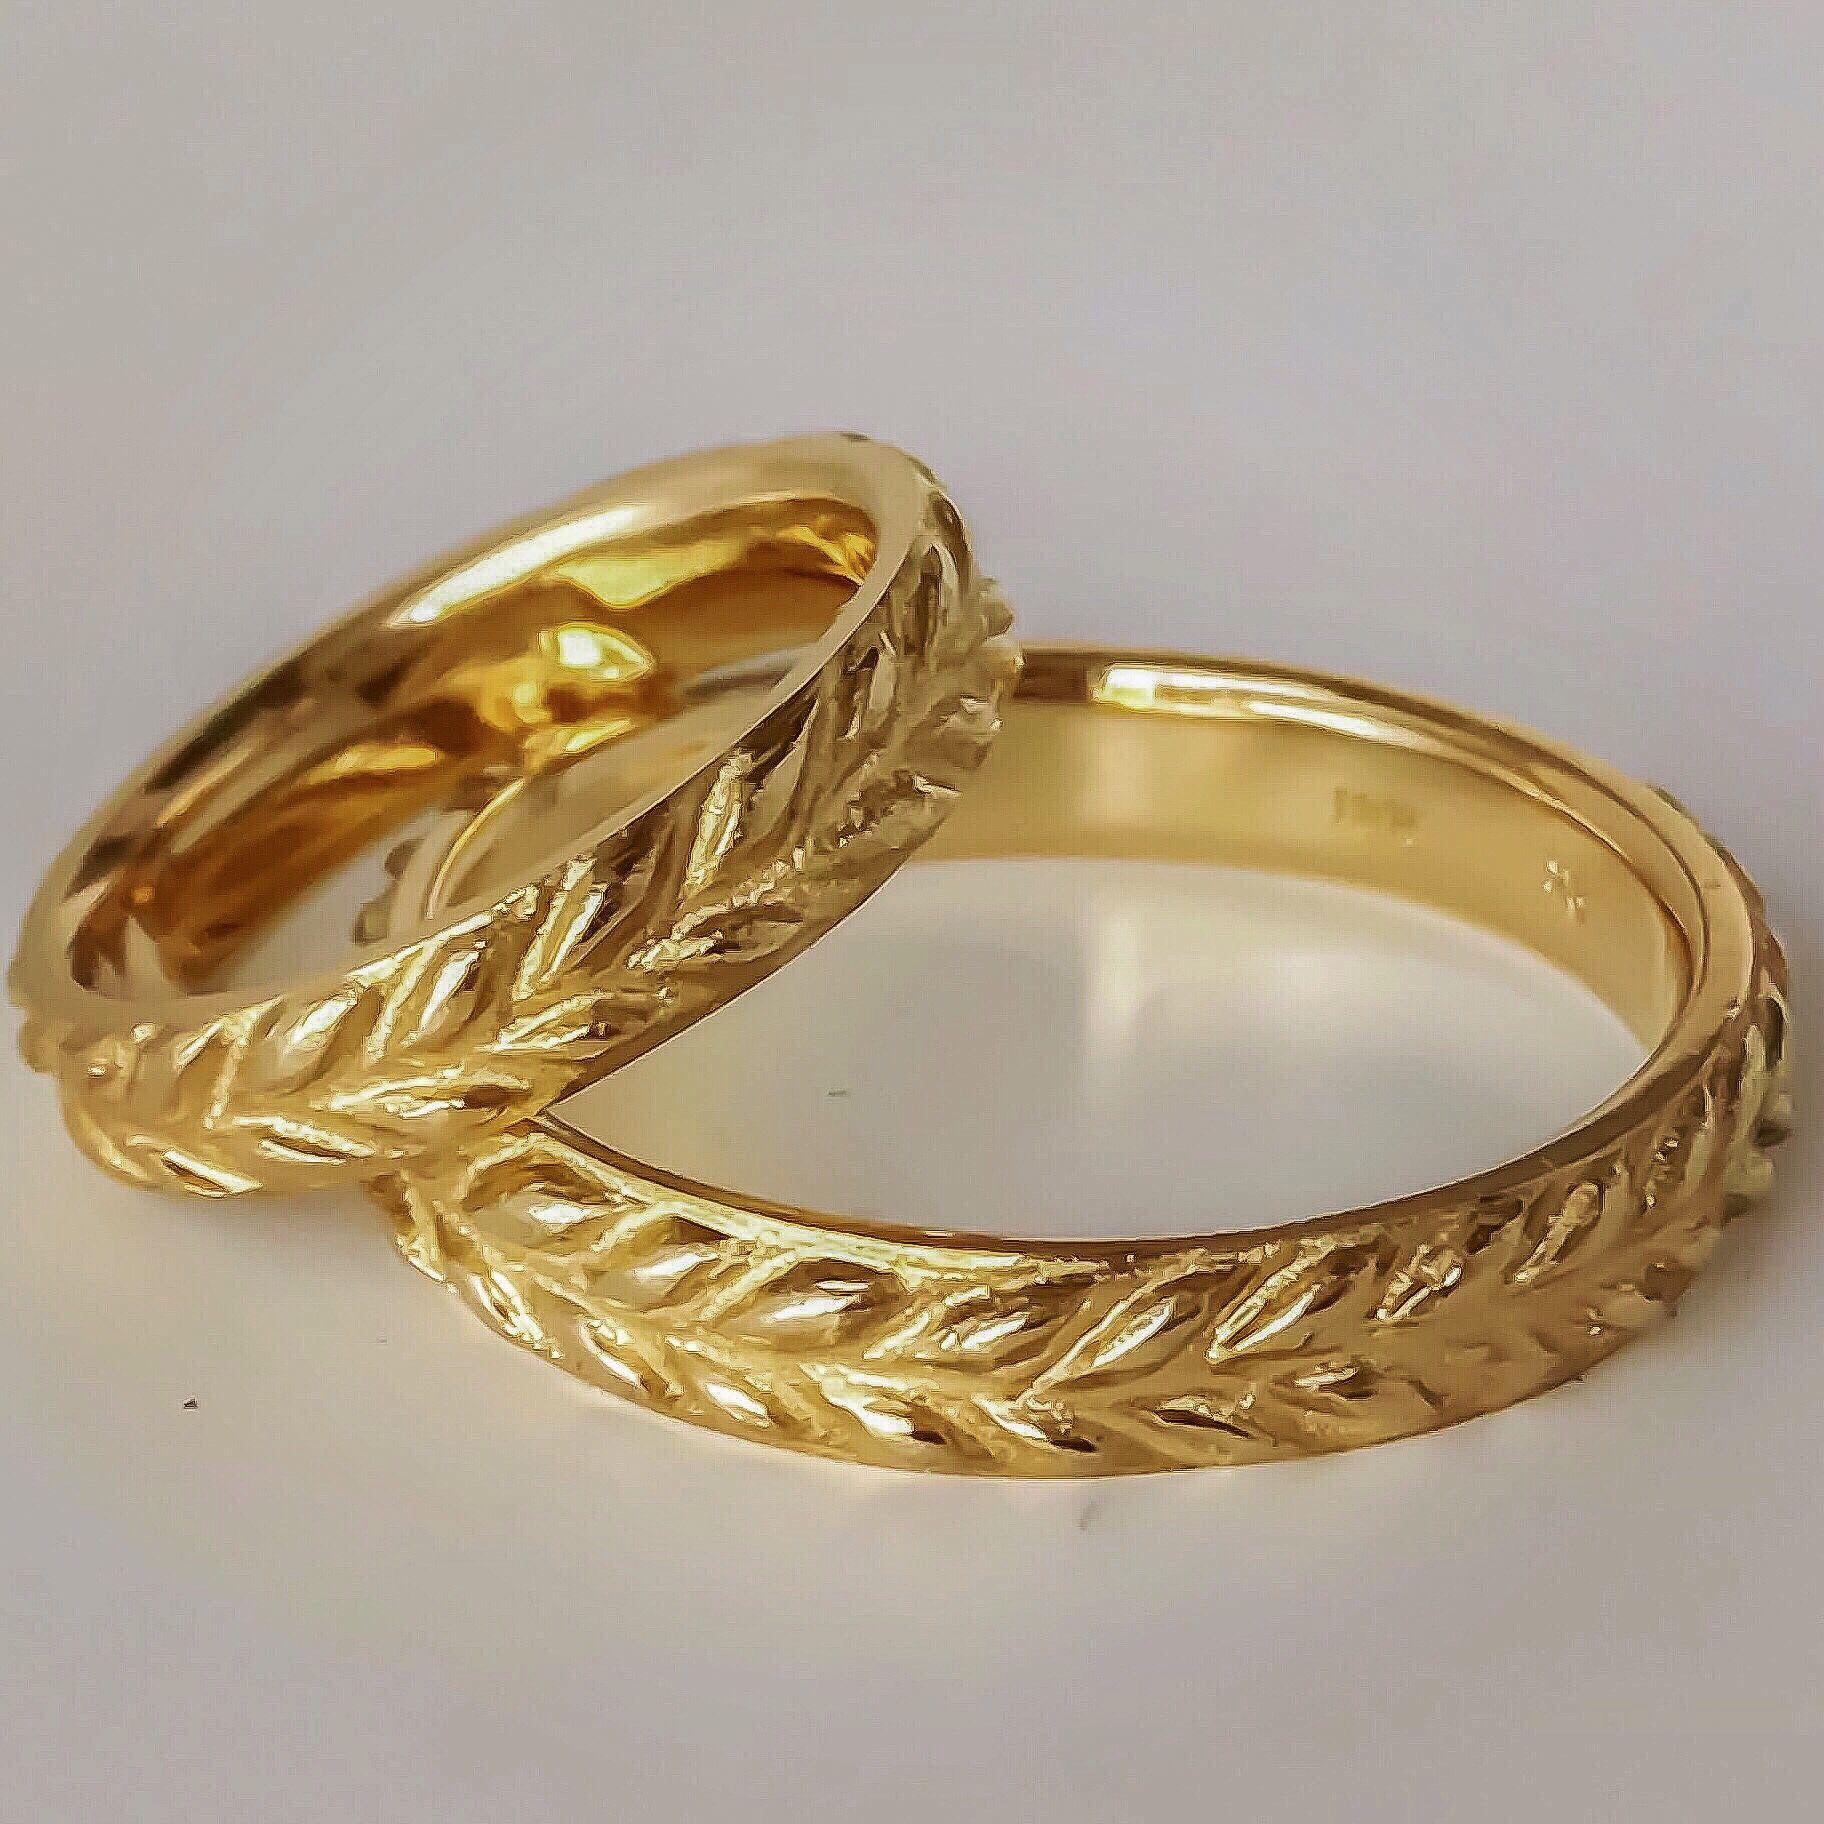 Roman Laurel Wedding Ring 18k Gold Wedding Band 4mm Wide Etsy 18k Gold Wedding Bands 18k Yellow Gold Wedding Band Vintage Wedding Band Gold